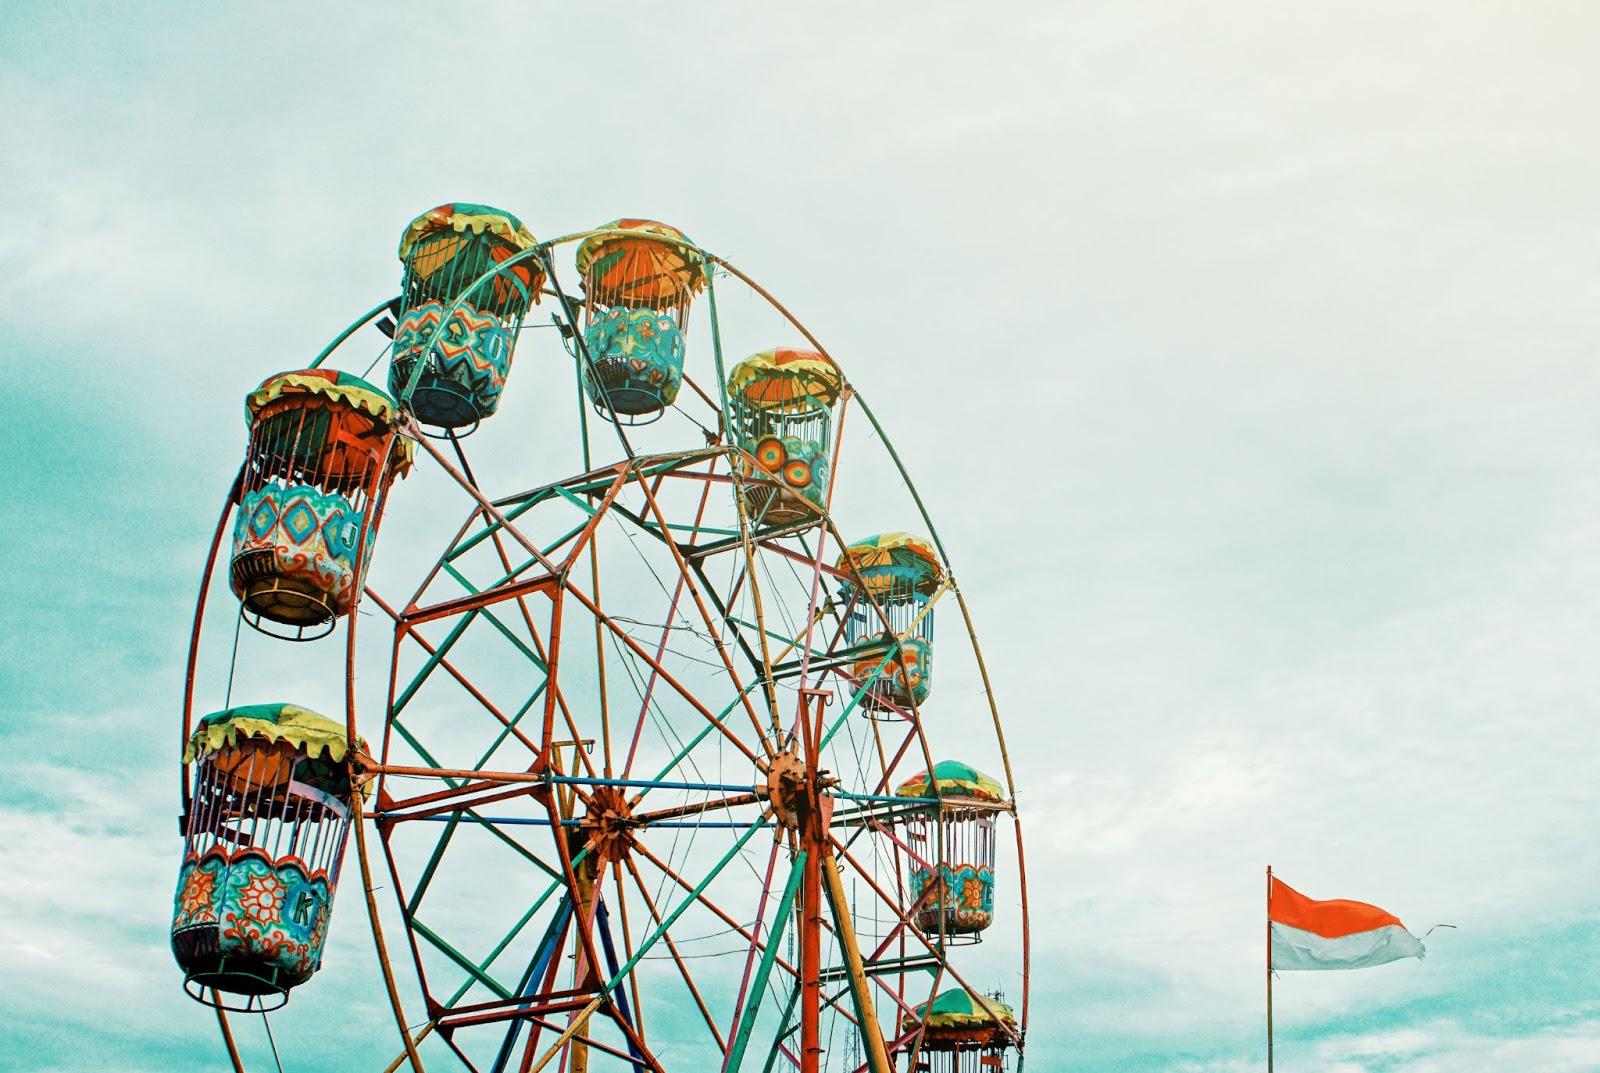 Colorful ferris wheel against a cloudy summerday sky.